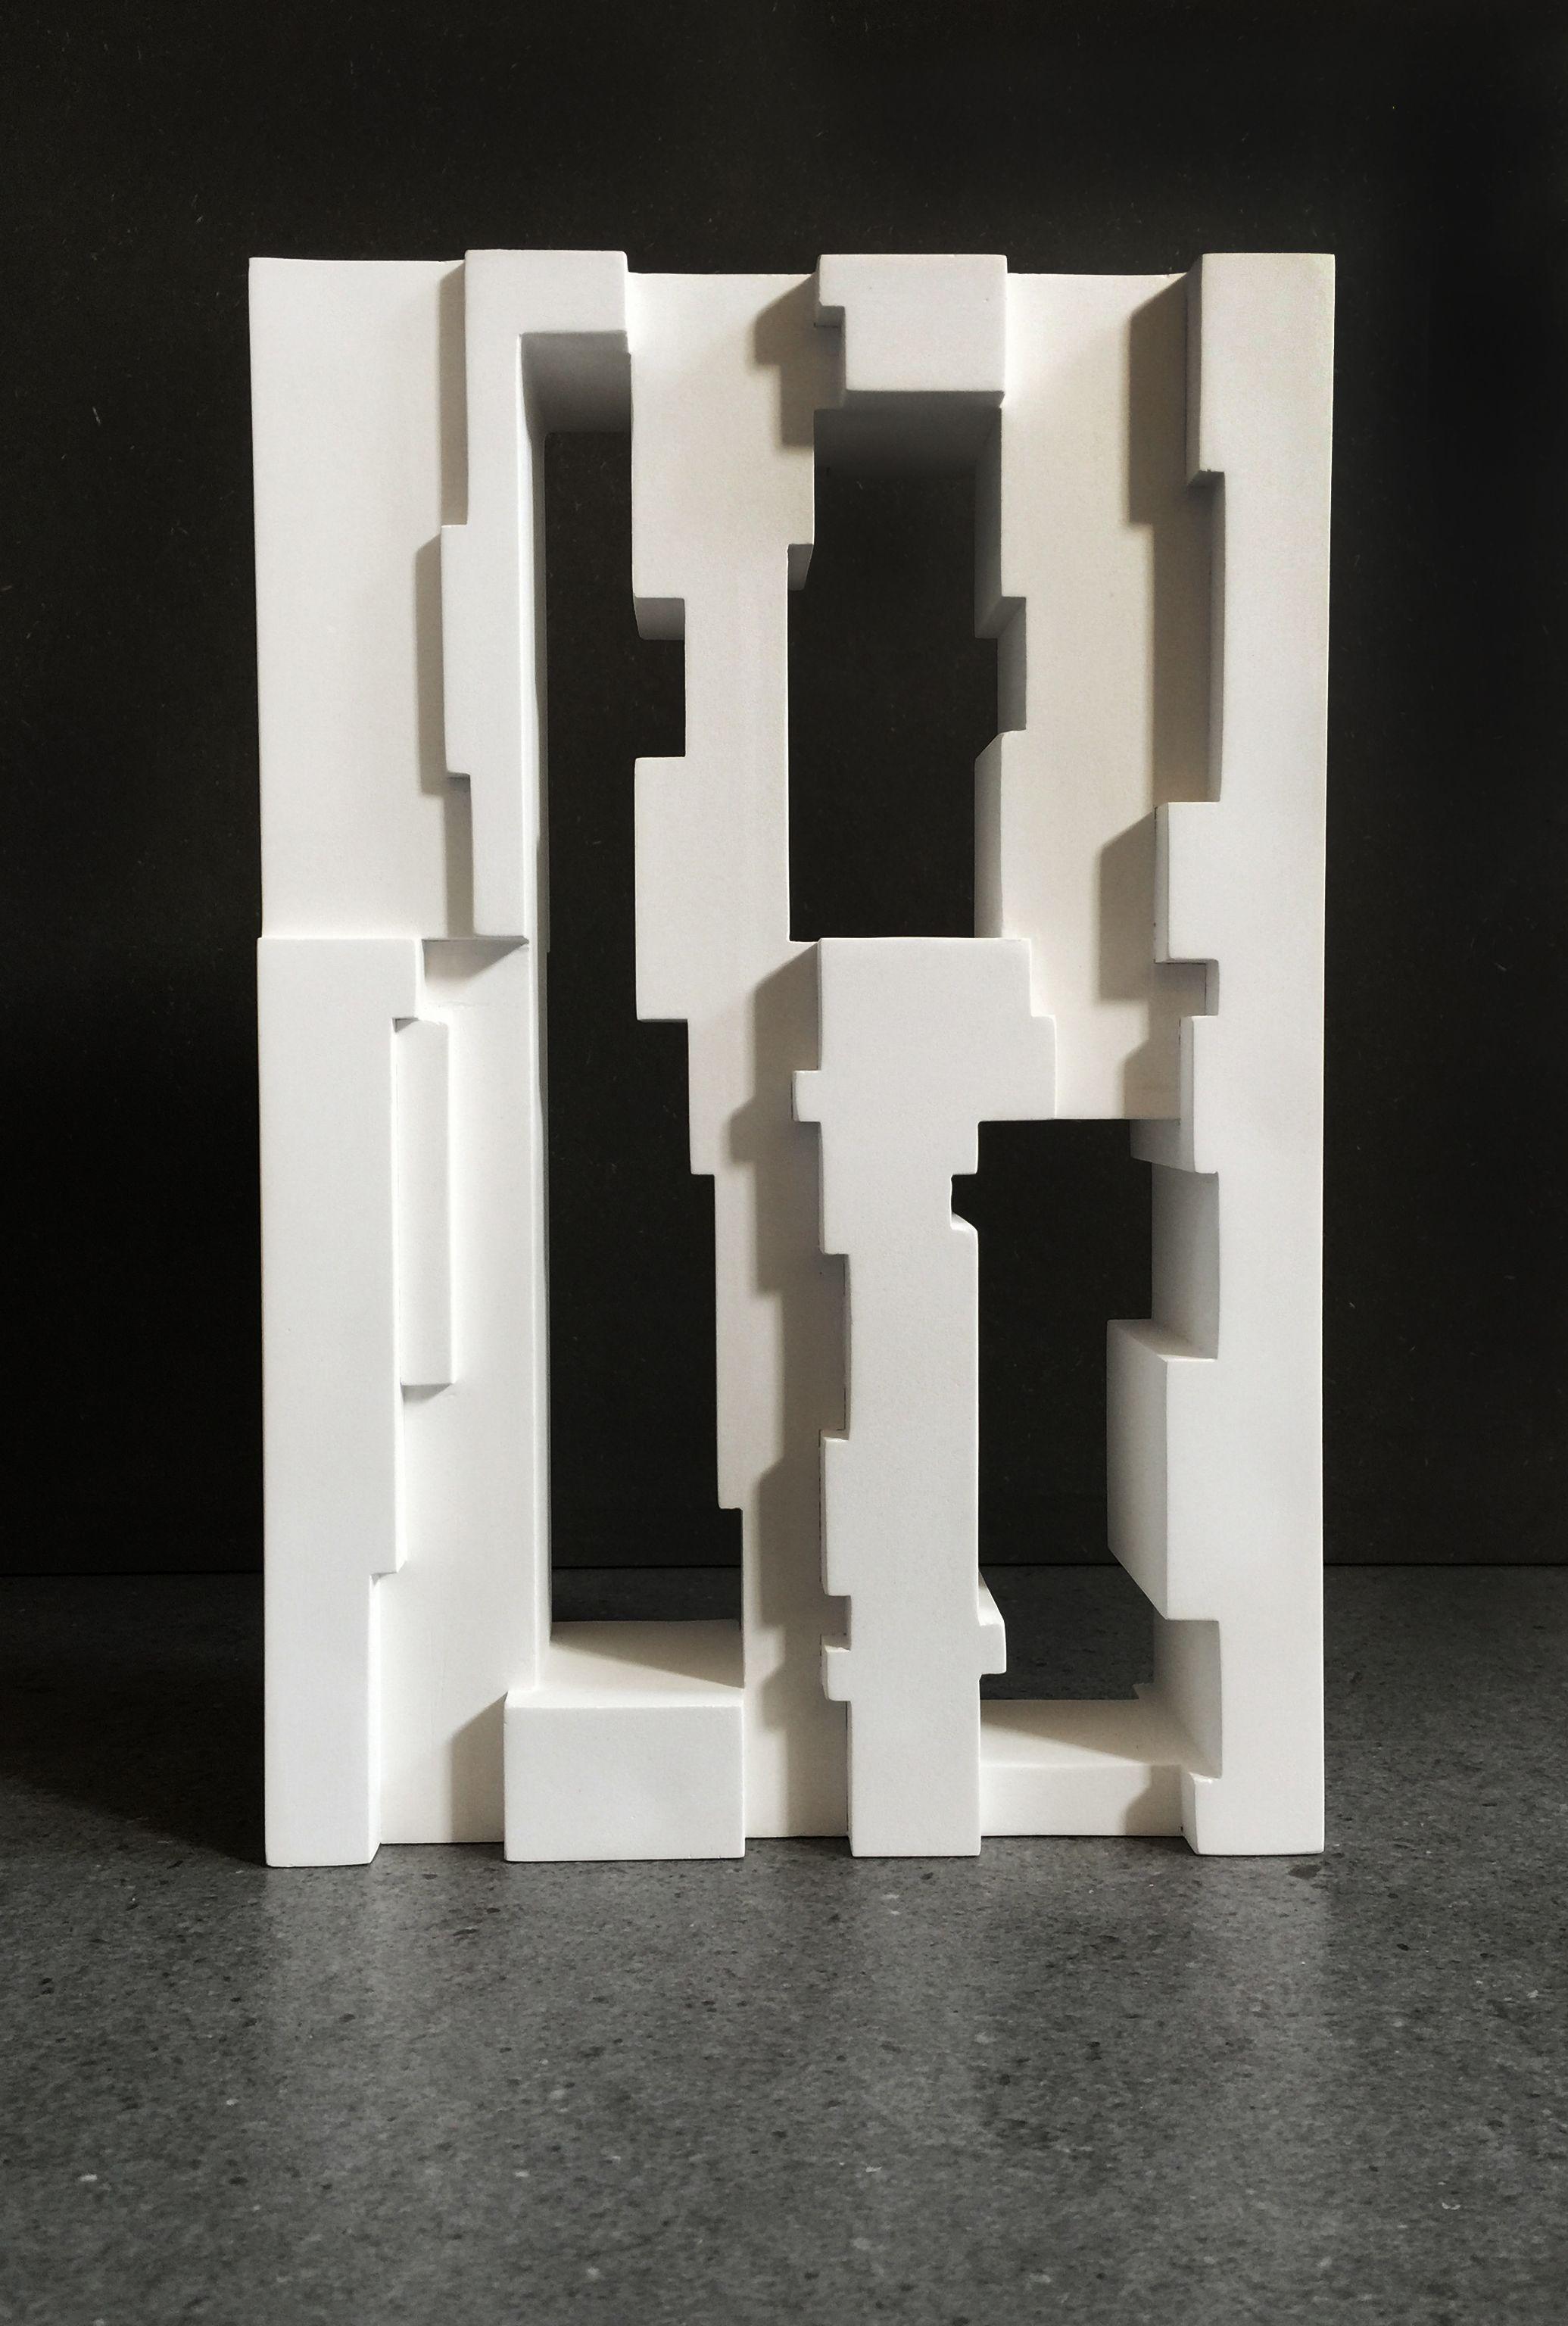 #frammento #cobogò #modular #element #elemento #modulare #paretidivisorie #wall #dividingwalls #architectural #gessoceramico #ceramicplaster  #mg12 #arredamentodiinterni